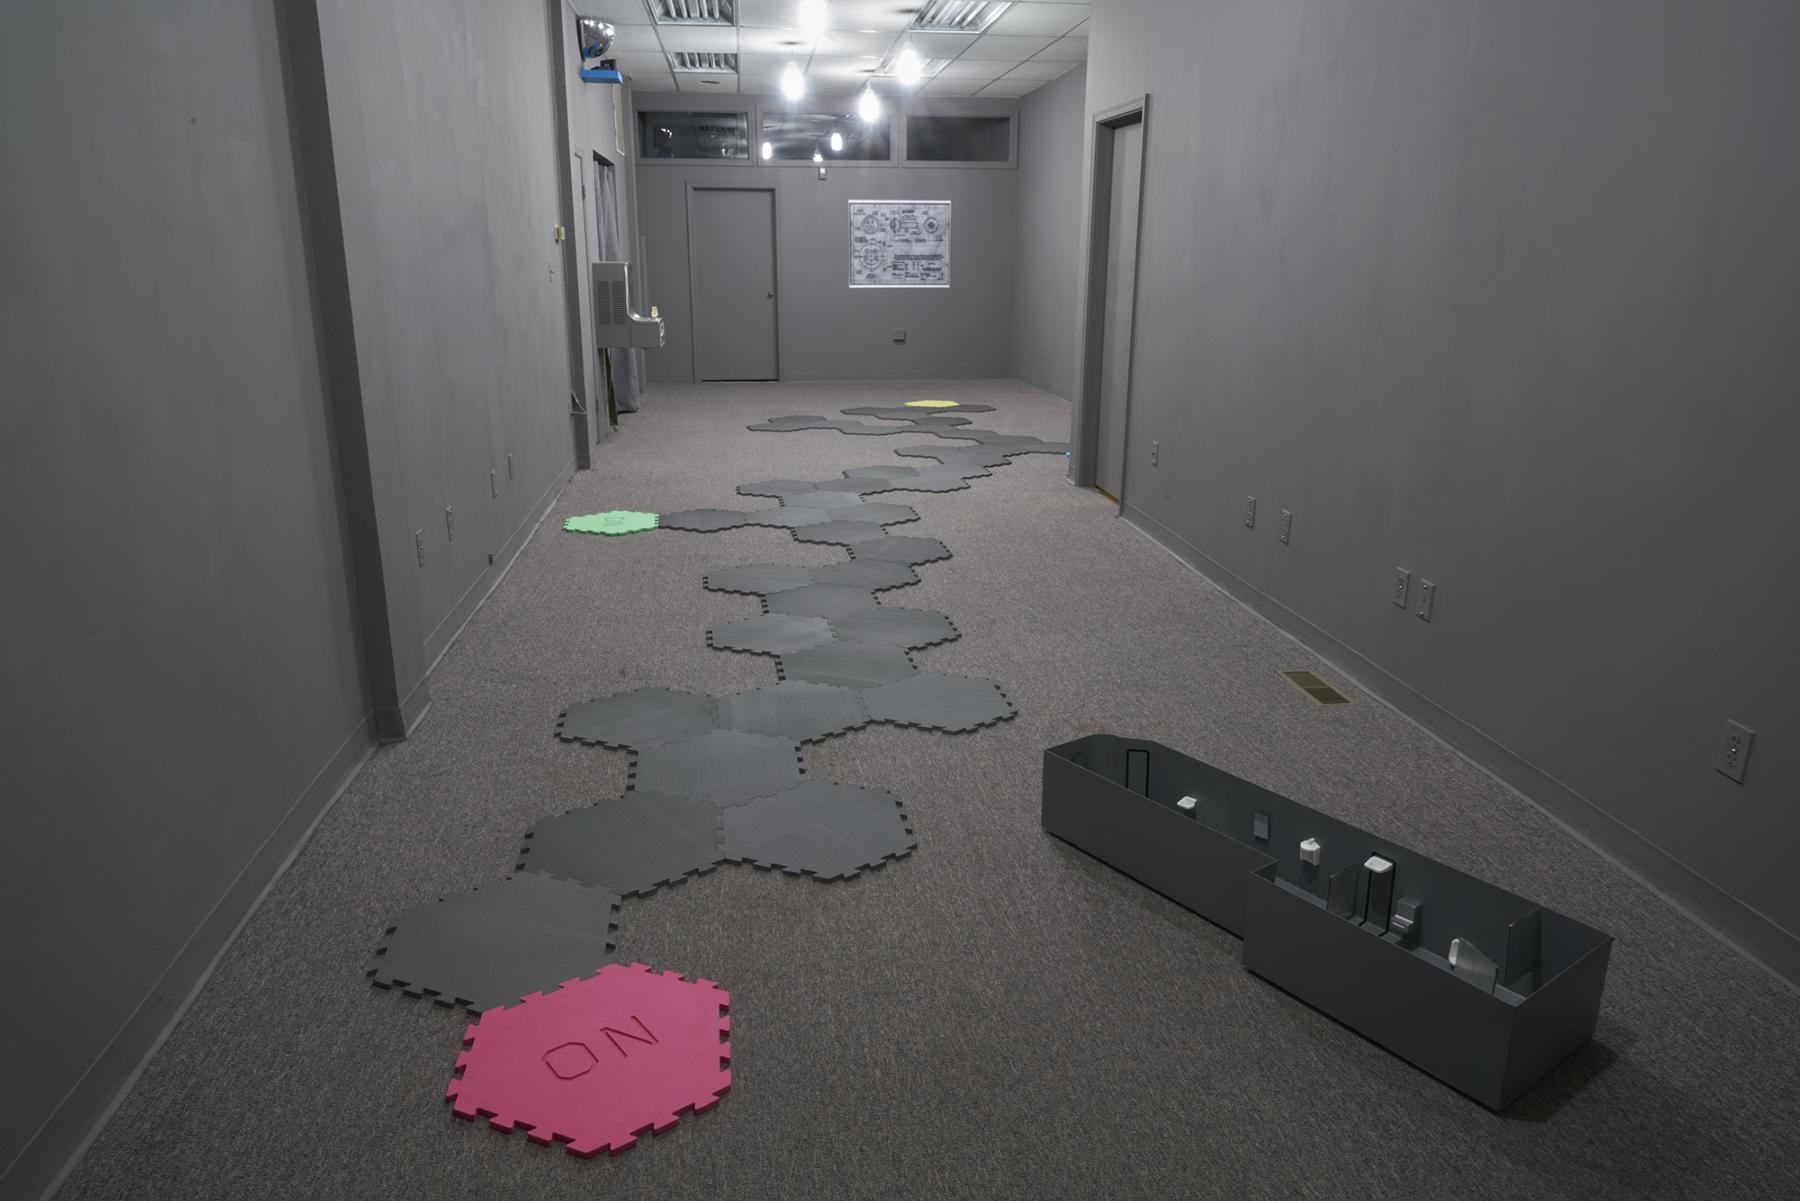 Installation view, Playroom: Alex Goss  at Bb